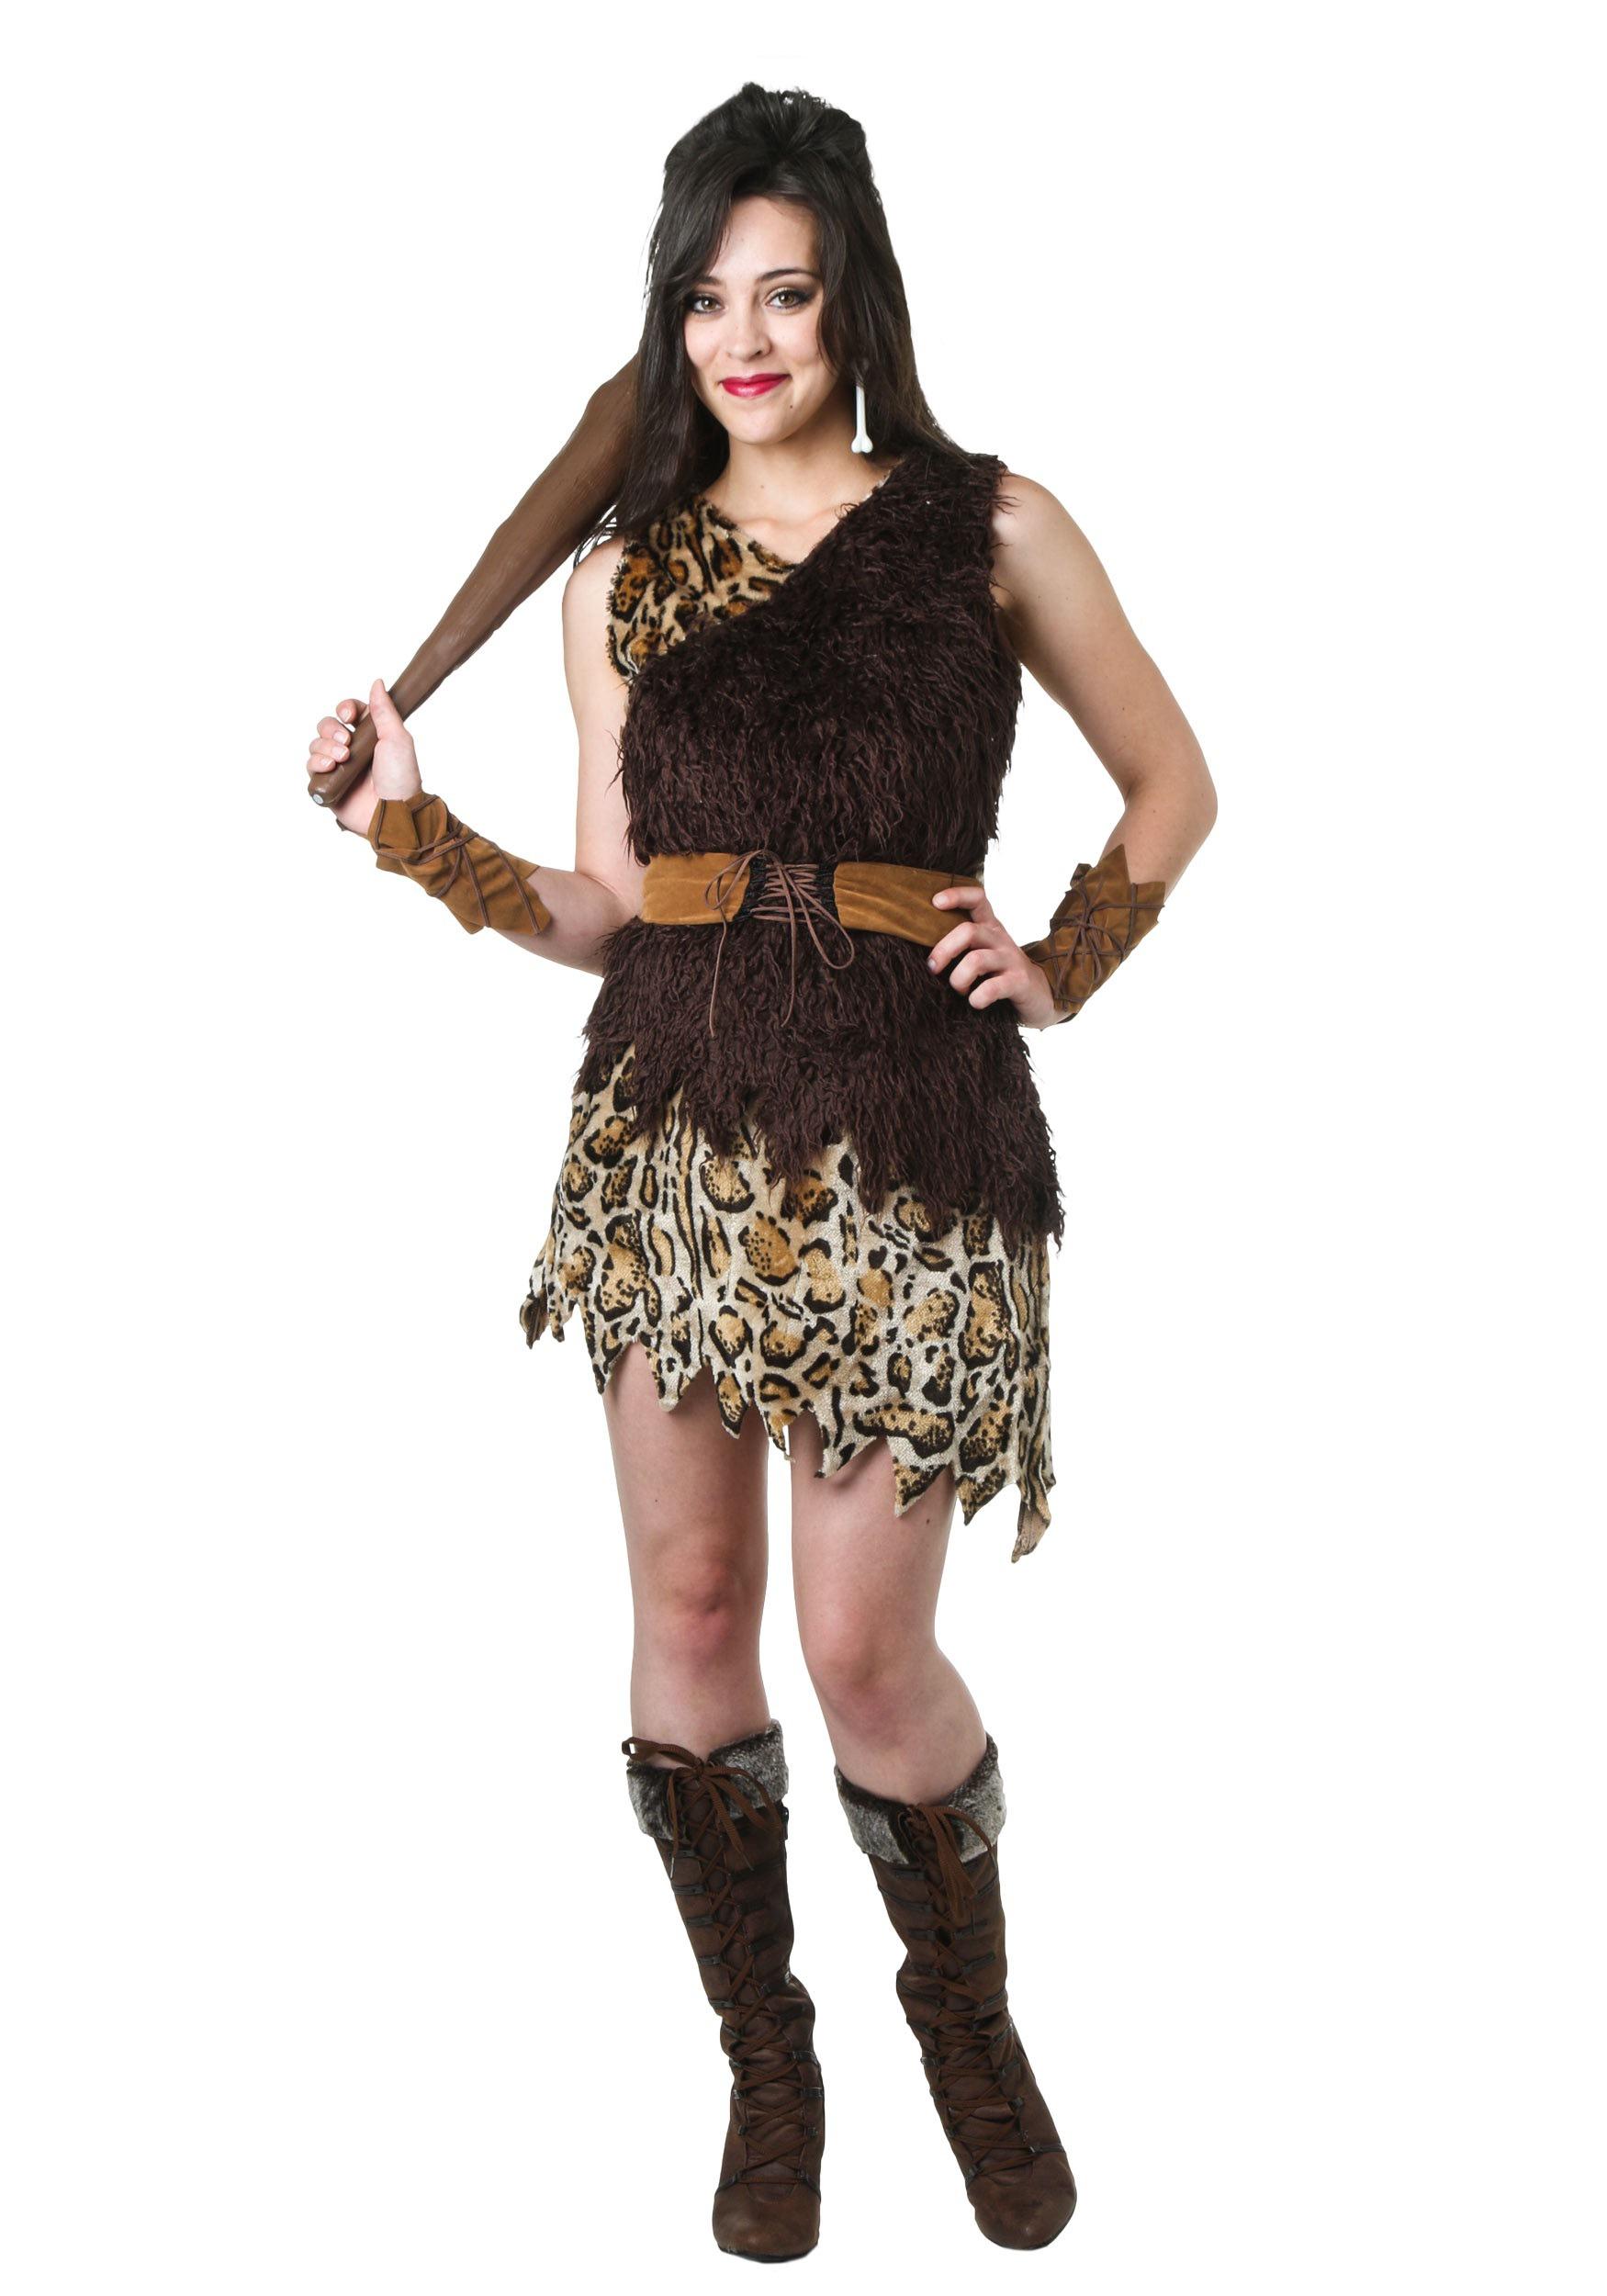 Caveman Dress Up Ideas : Cavewoman costume